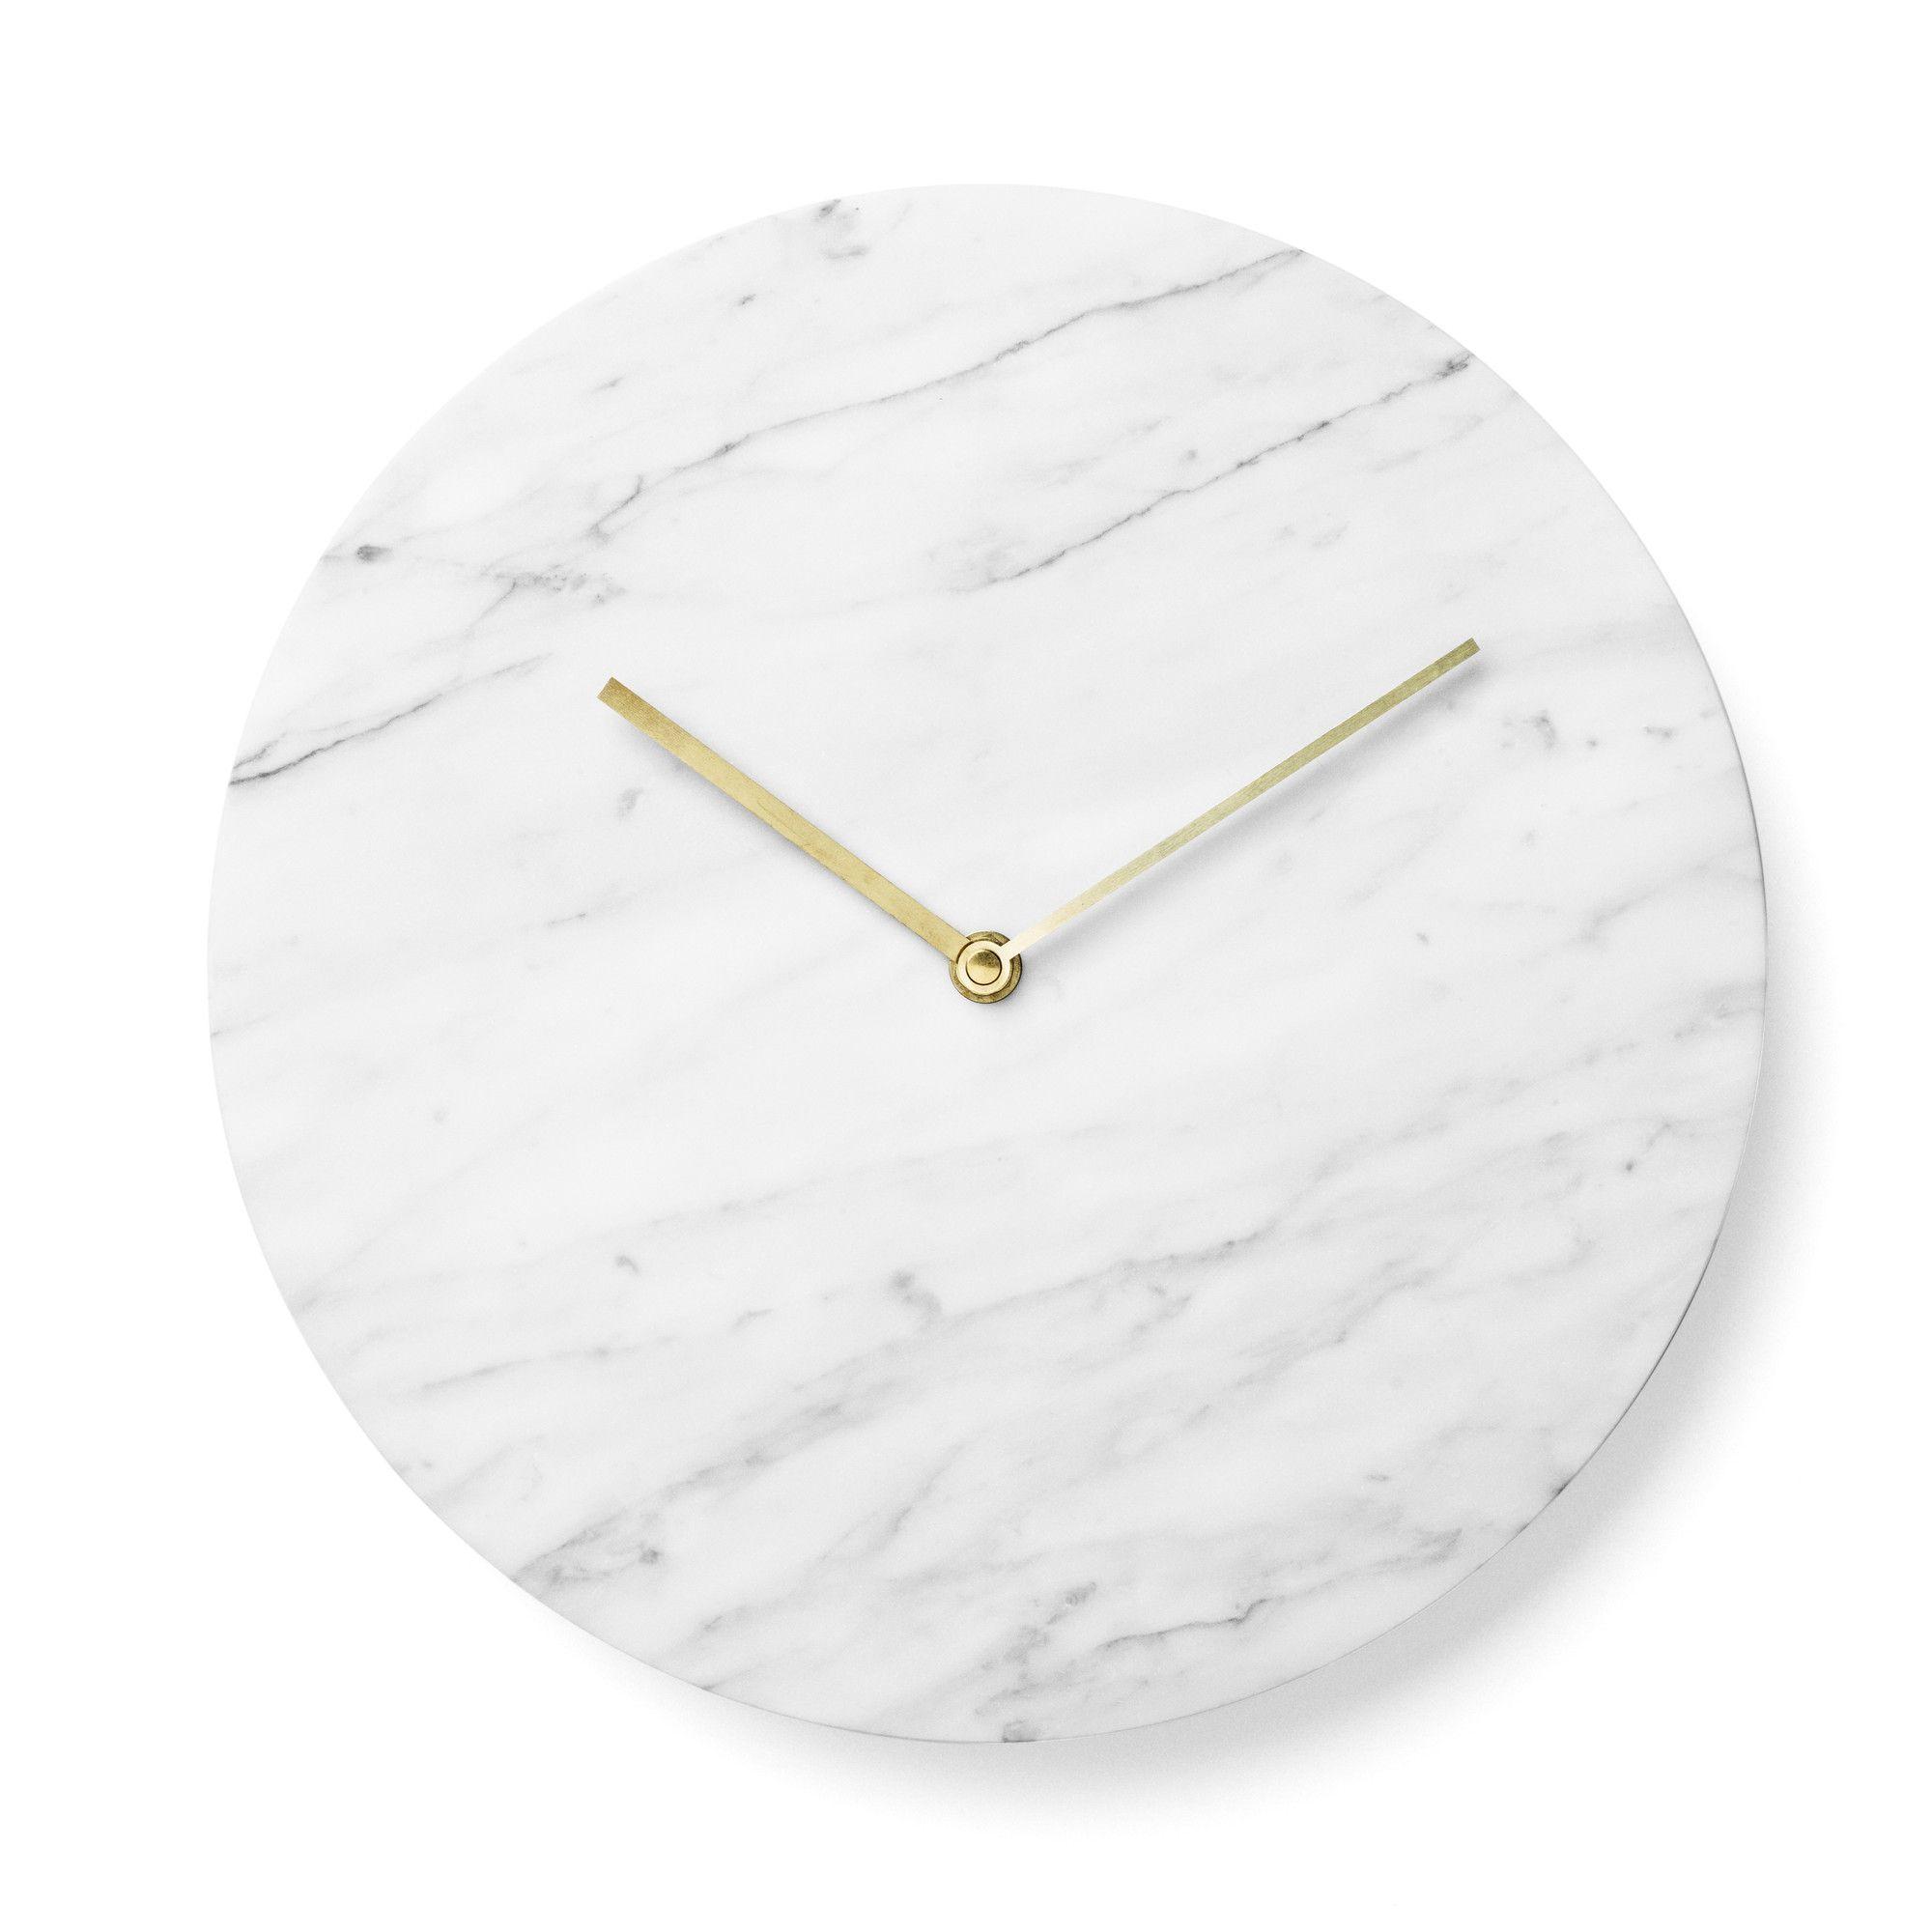 Norm Architects Decor 12 Wall Clock Wall Clock Design White Wall Clocks Marble Wall